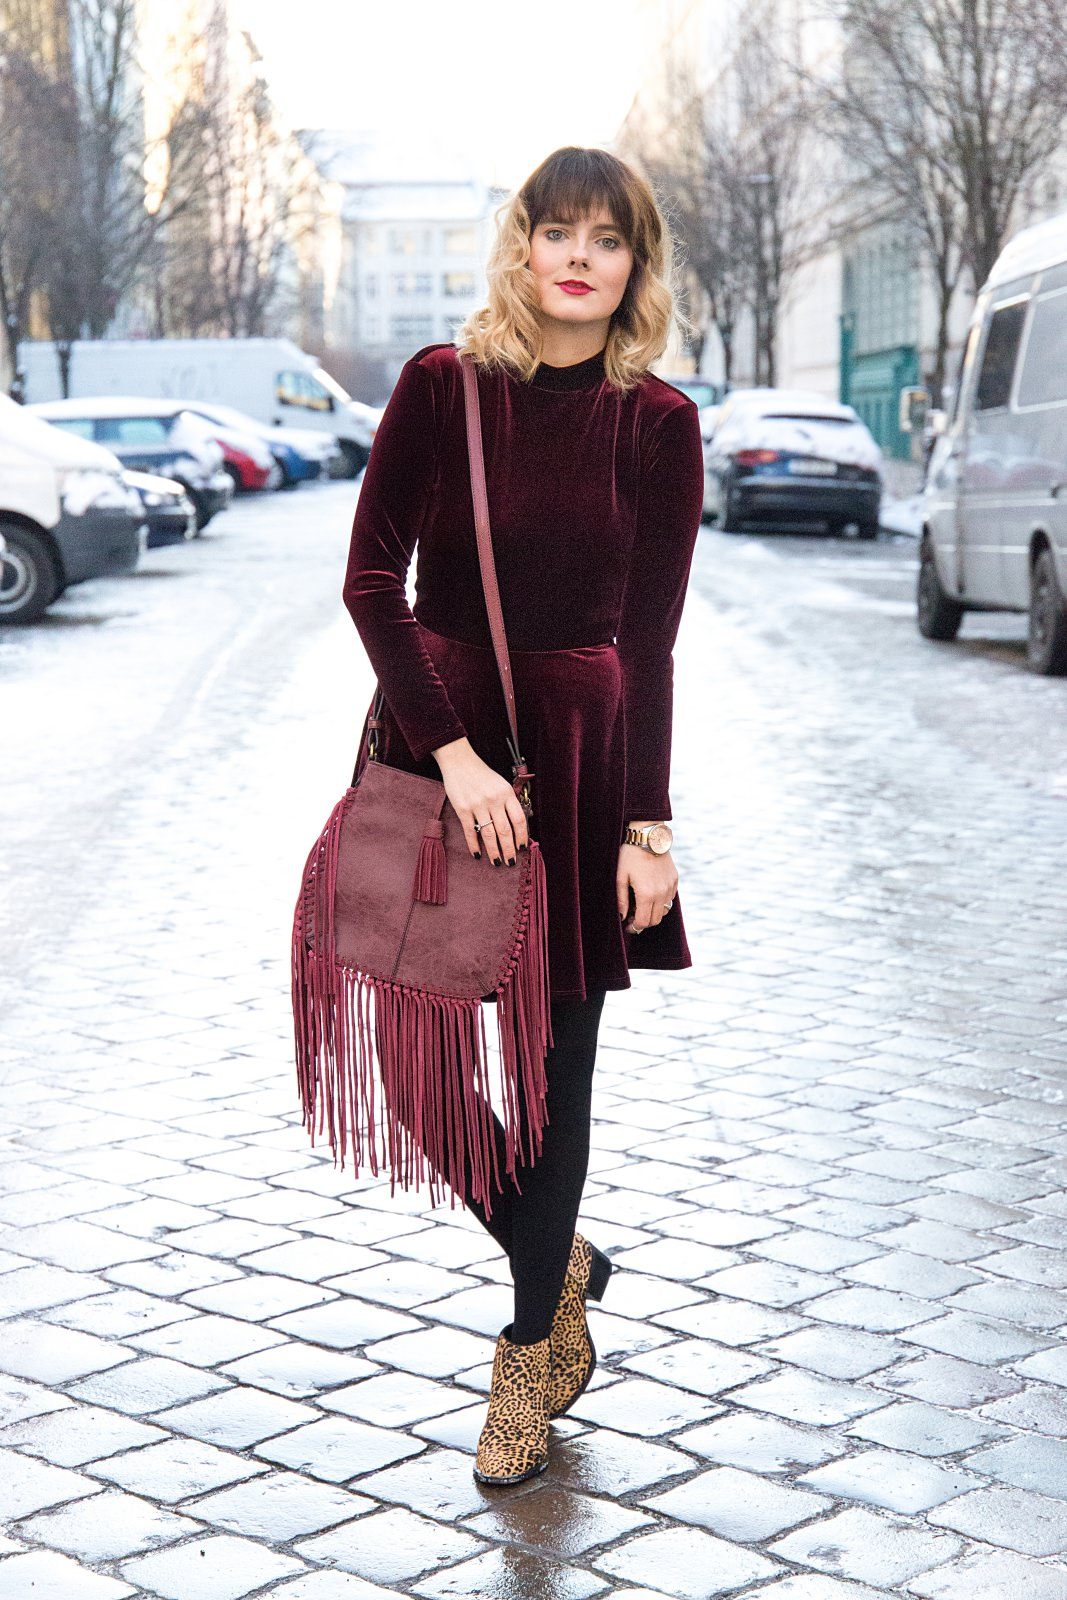 desbelleschoses-fashion-blog-köln-deutschland-berlin-fashion-week-januar-2016-streetstyle-tag-2-samtkleid-leo-boots 11